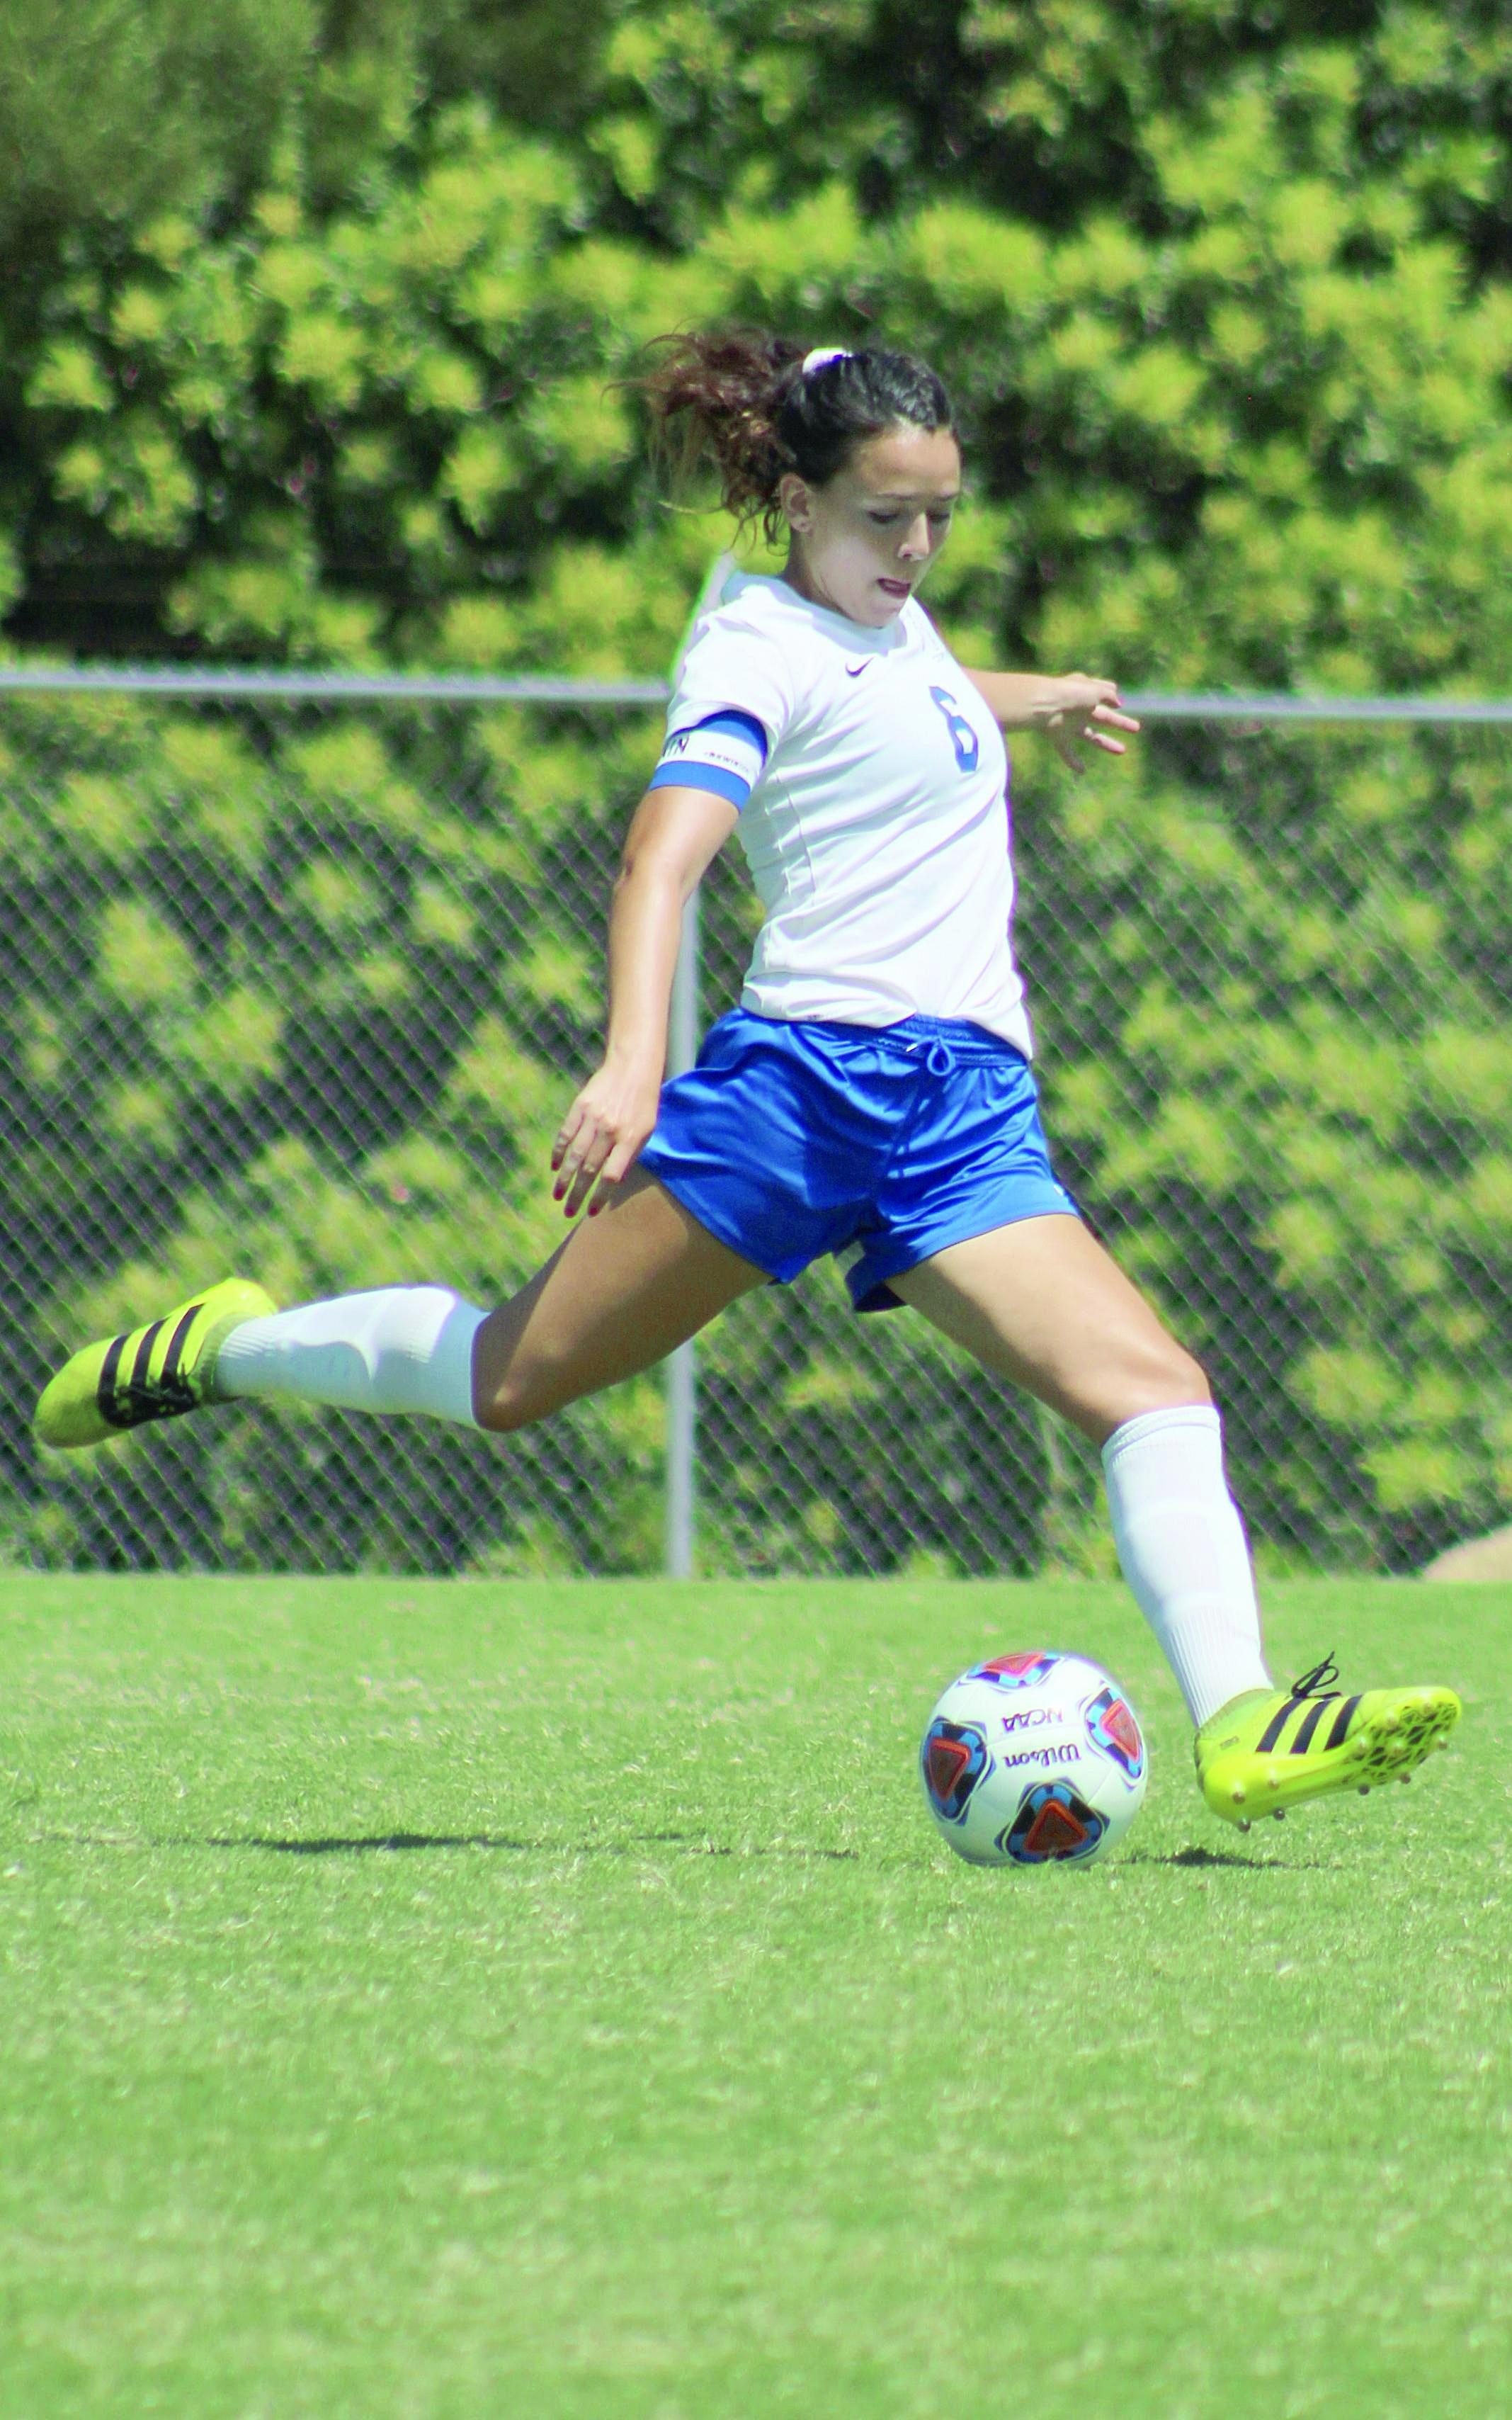 Number six sophomore Antoinette Saldana crosses ball across field at Mira Costa College in Oceanside,Calif. September 7, 2018. (Samantha Morales/Corsair Photo)